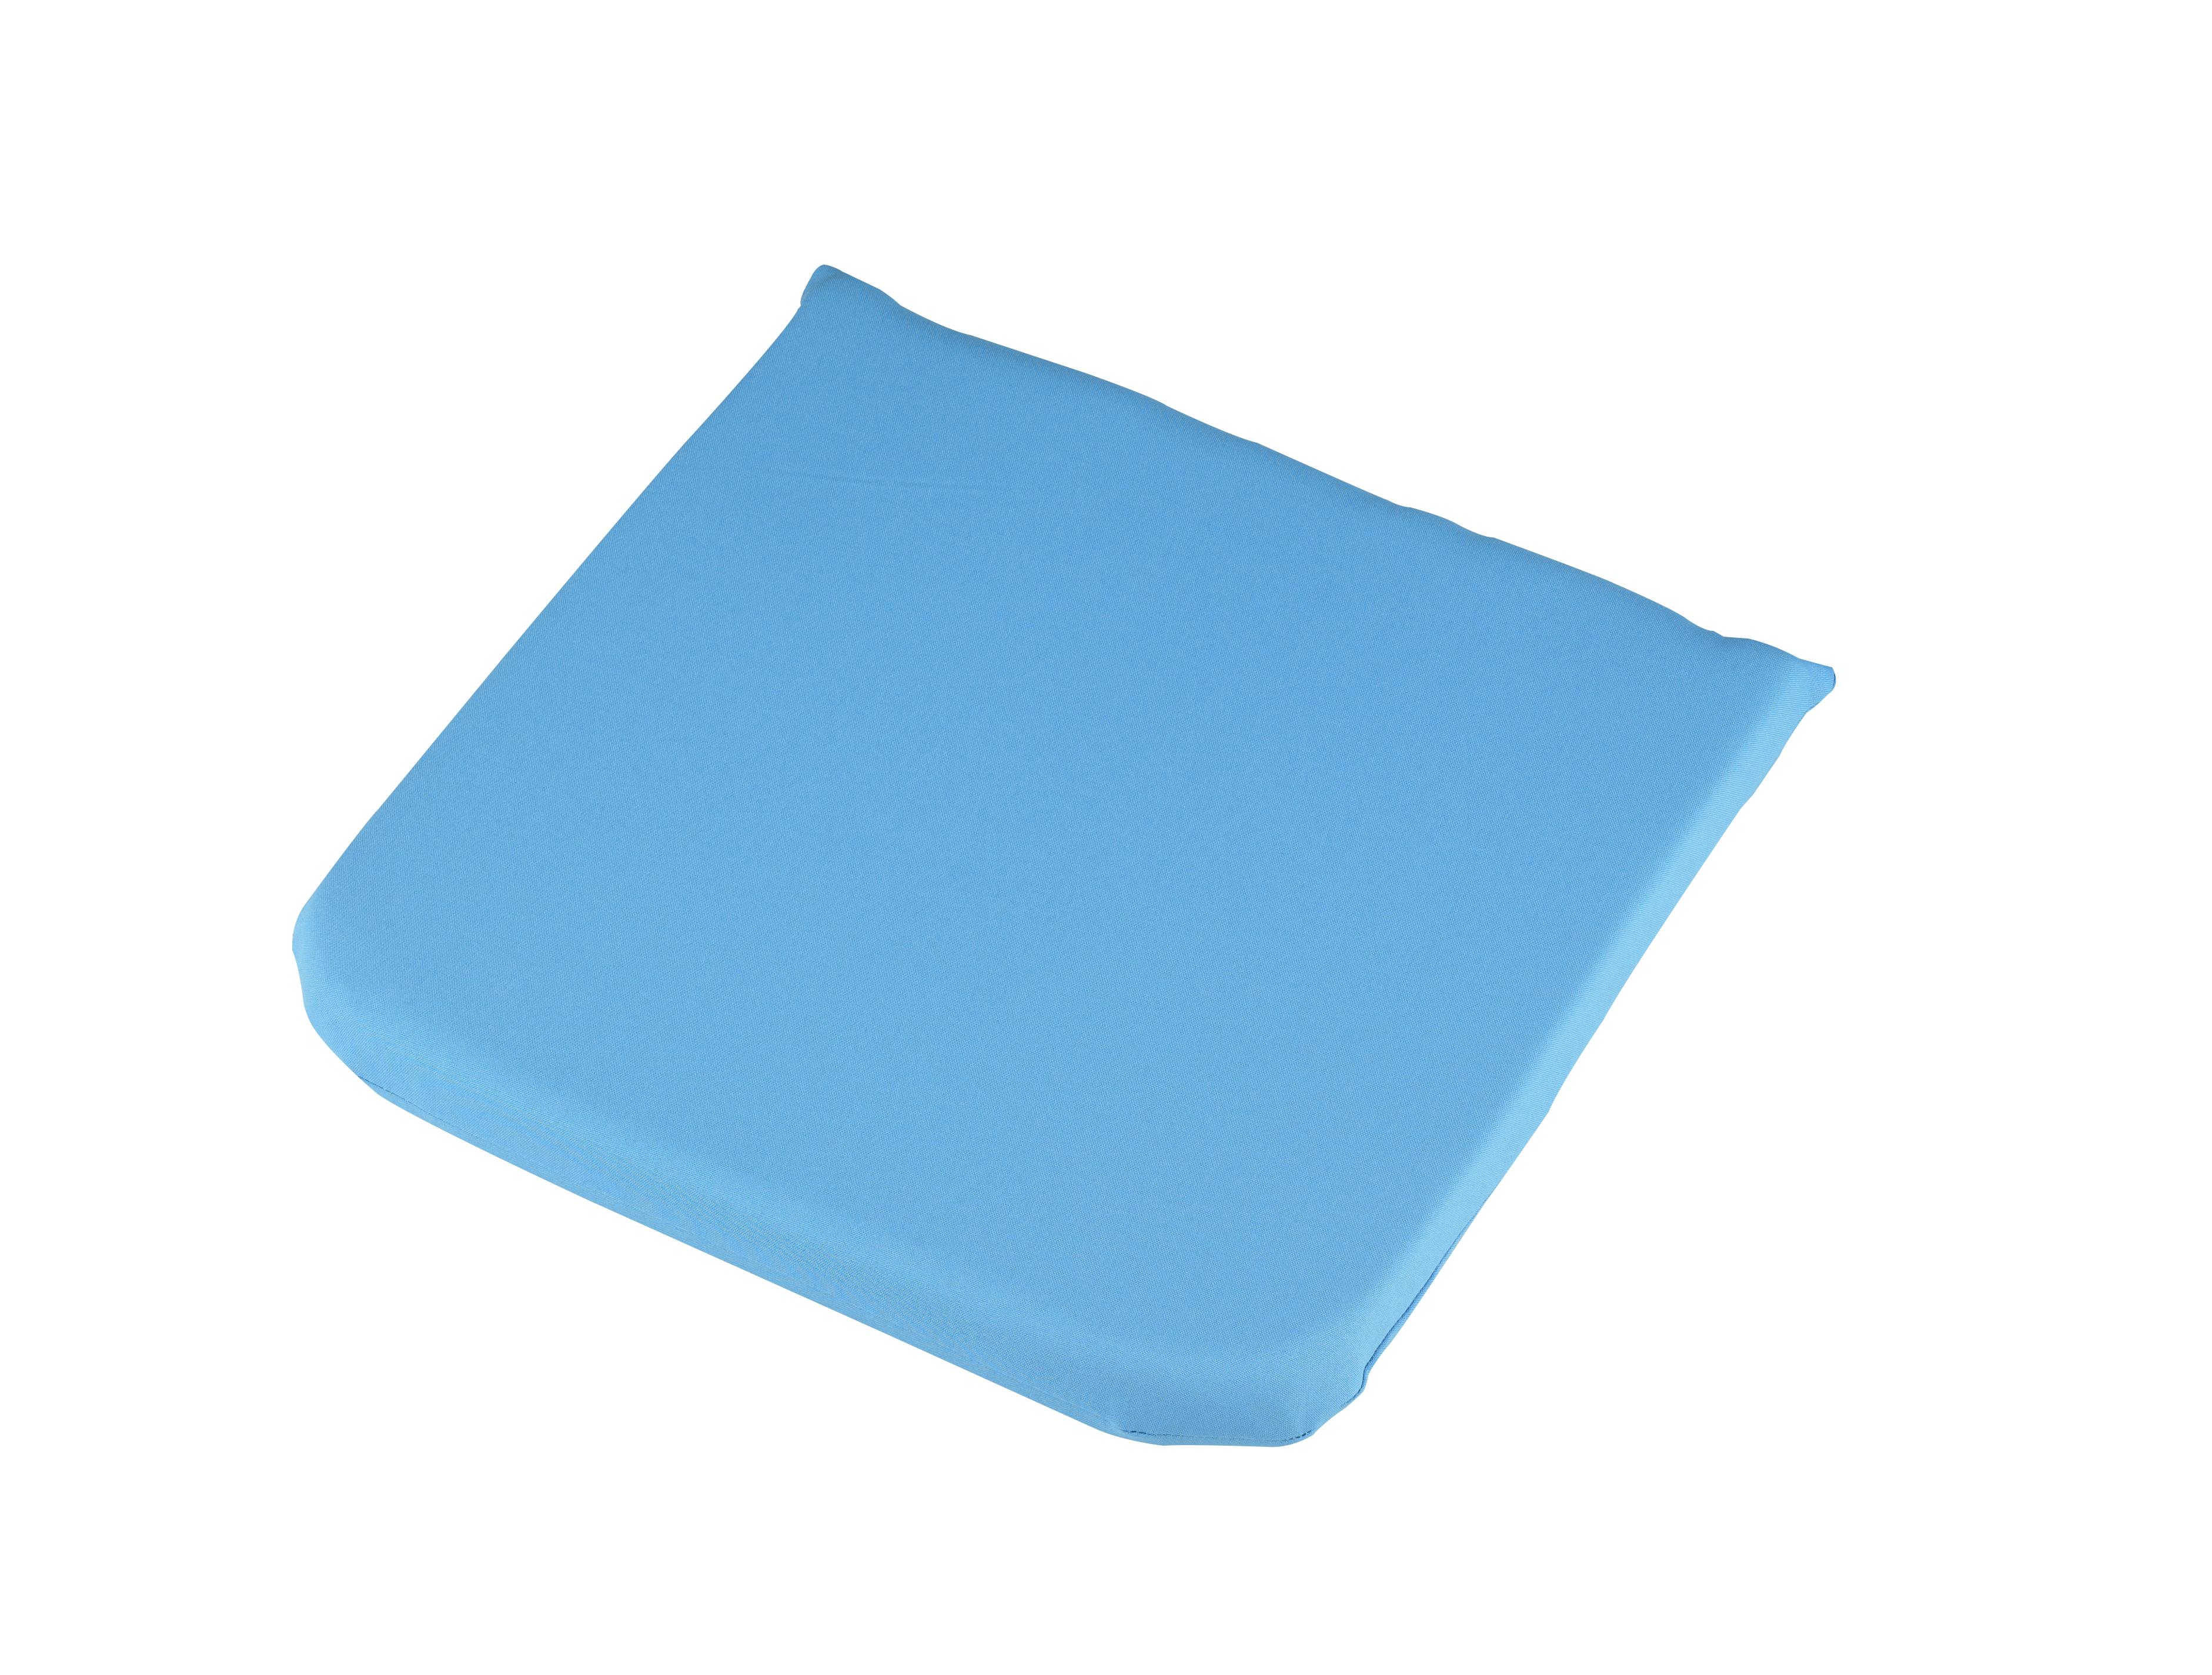 GL1072 SQUARE CUSH TURQUOISE BLUE